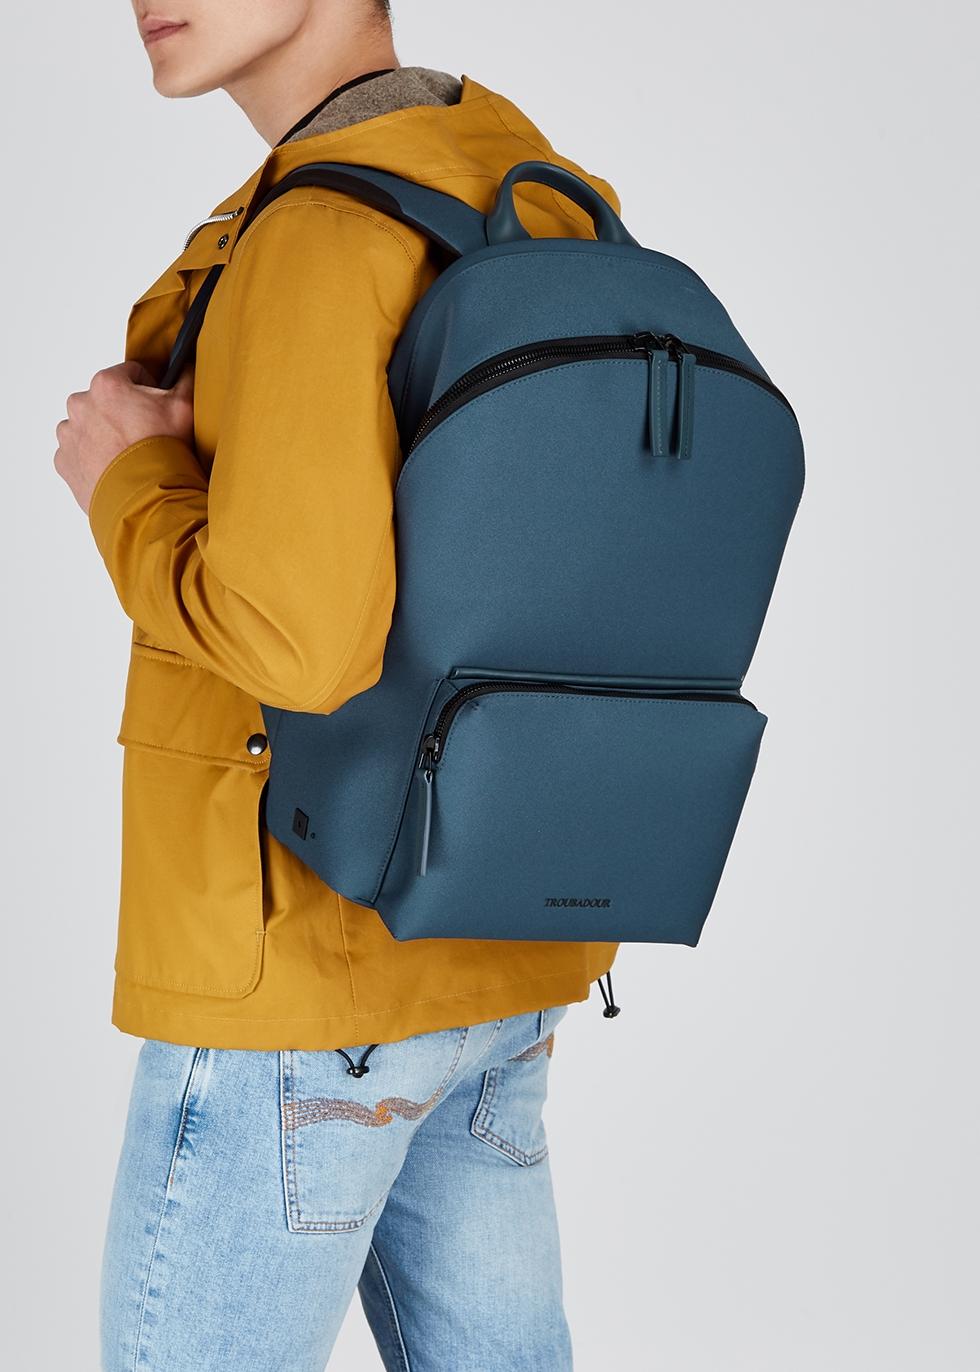 Troubadour Adventure Slipstream canvas backpack Harvey Nichols